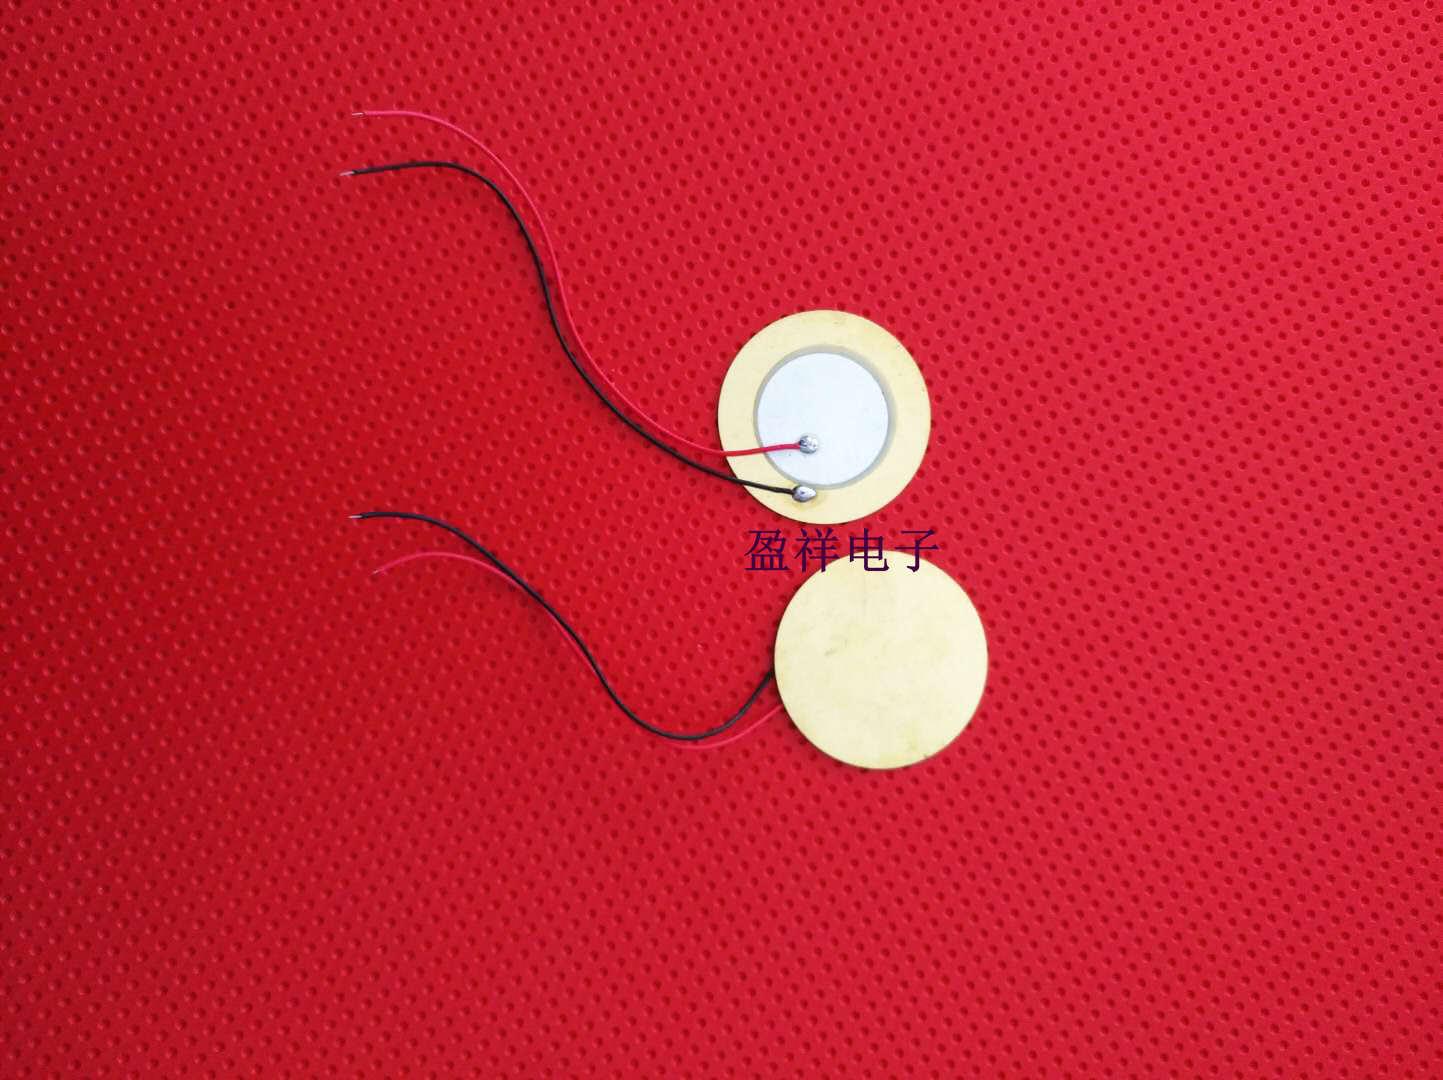 Game machine accessories music machine accessories drum machine frame golden castle drum buzzer sensor vibration induction